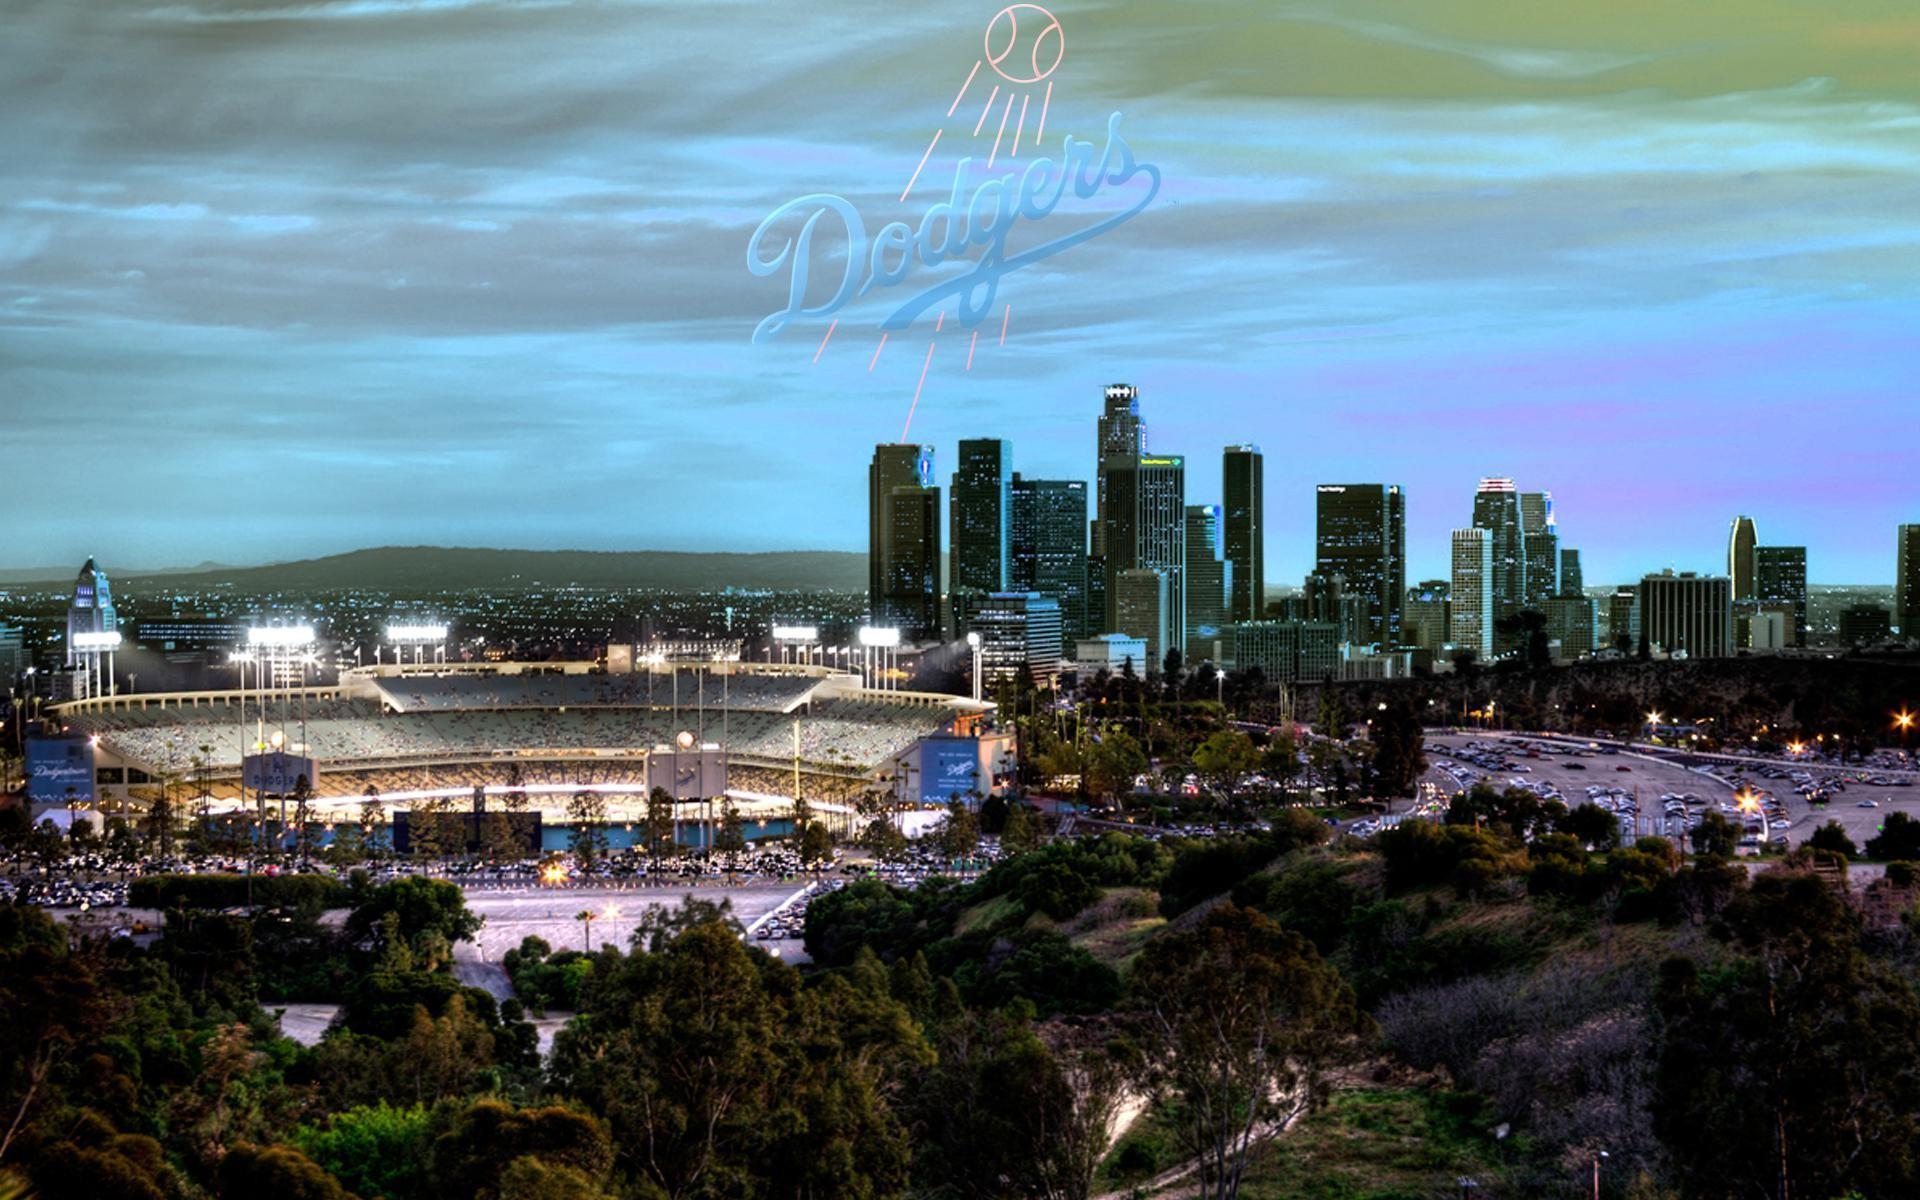 1920x1200, Los Angeles Dodgers Images Screen Hd Free - Dodger Stadium Downtown La - HD Wallpaper